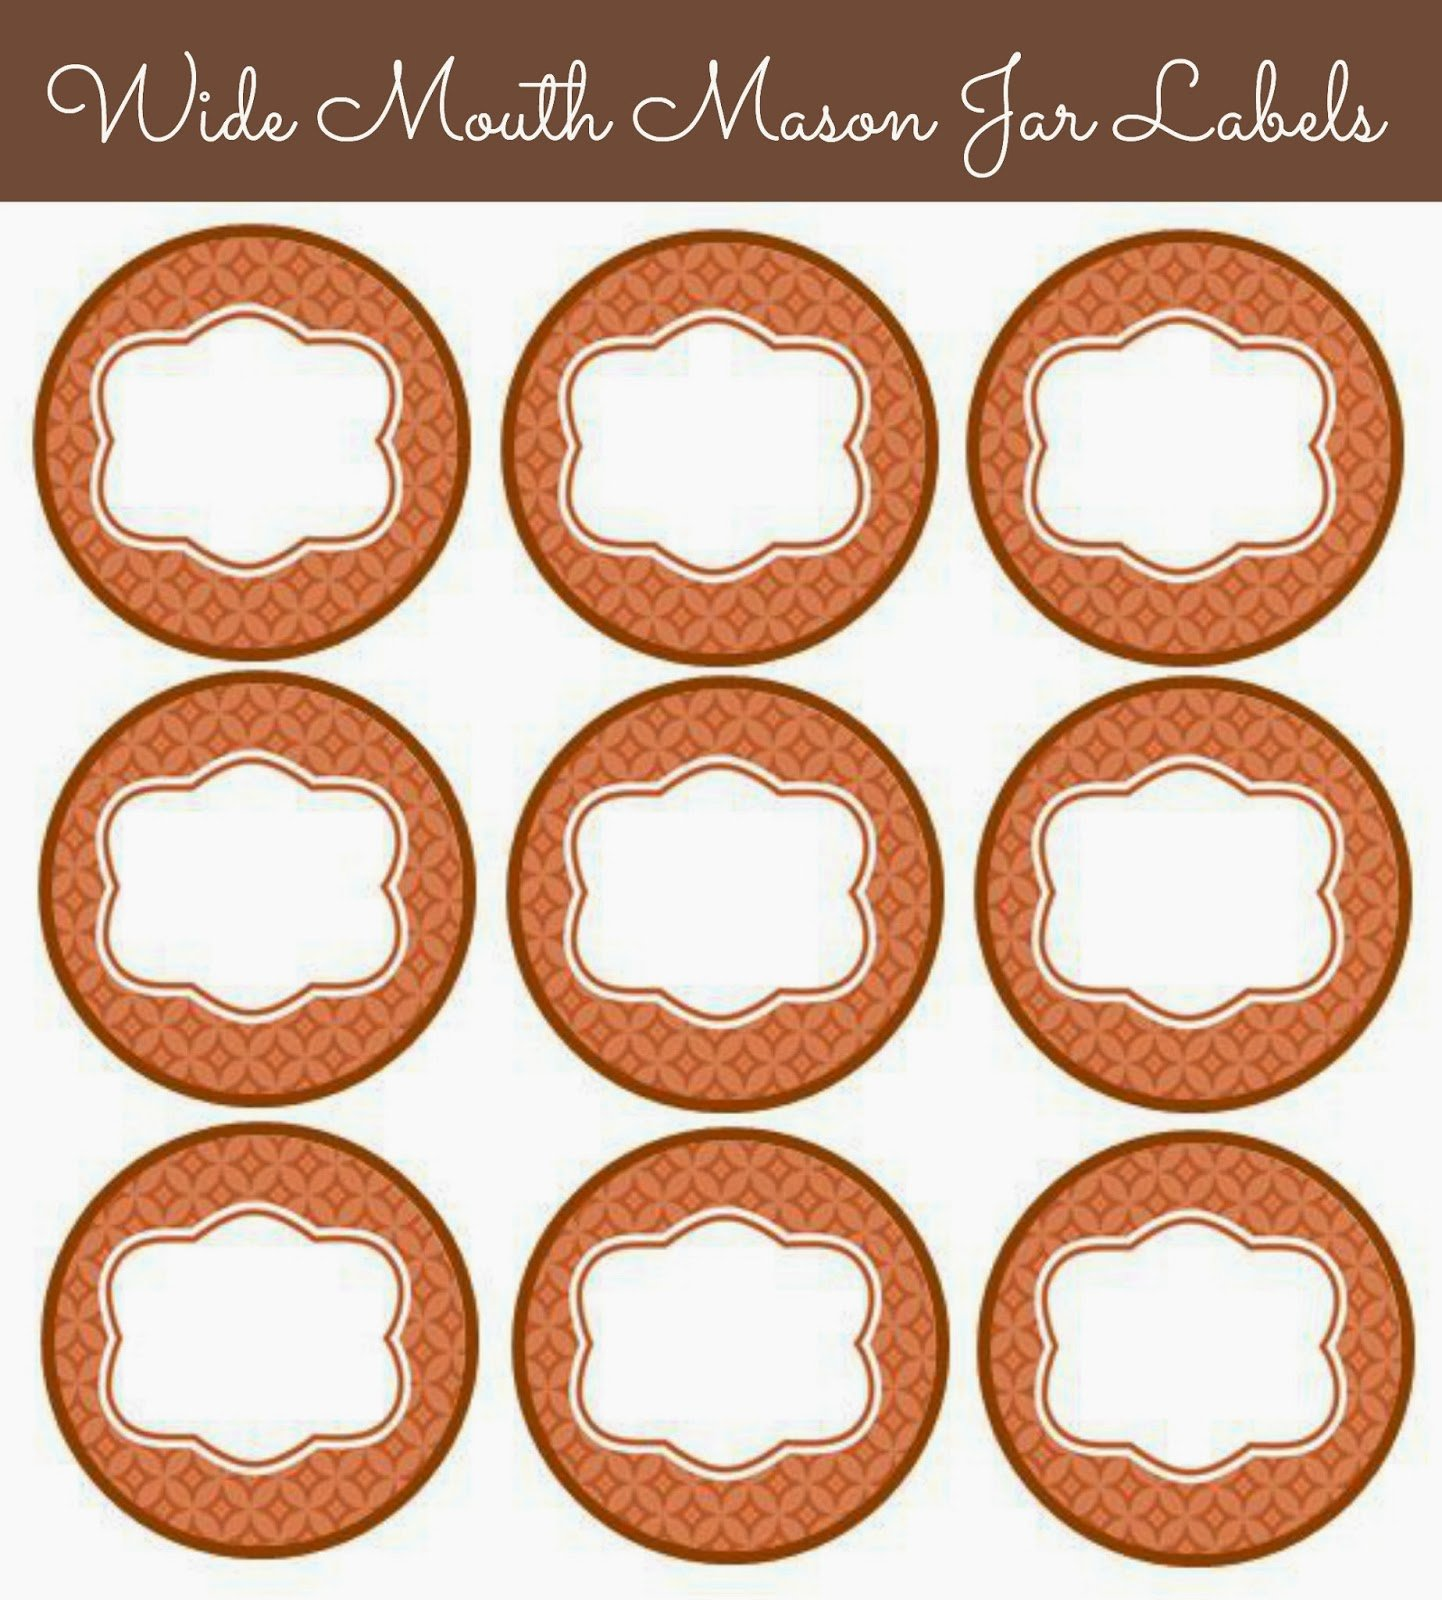 Mason Jar Tags Template Unique 56 Cute Mason Jar Labels